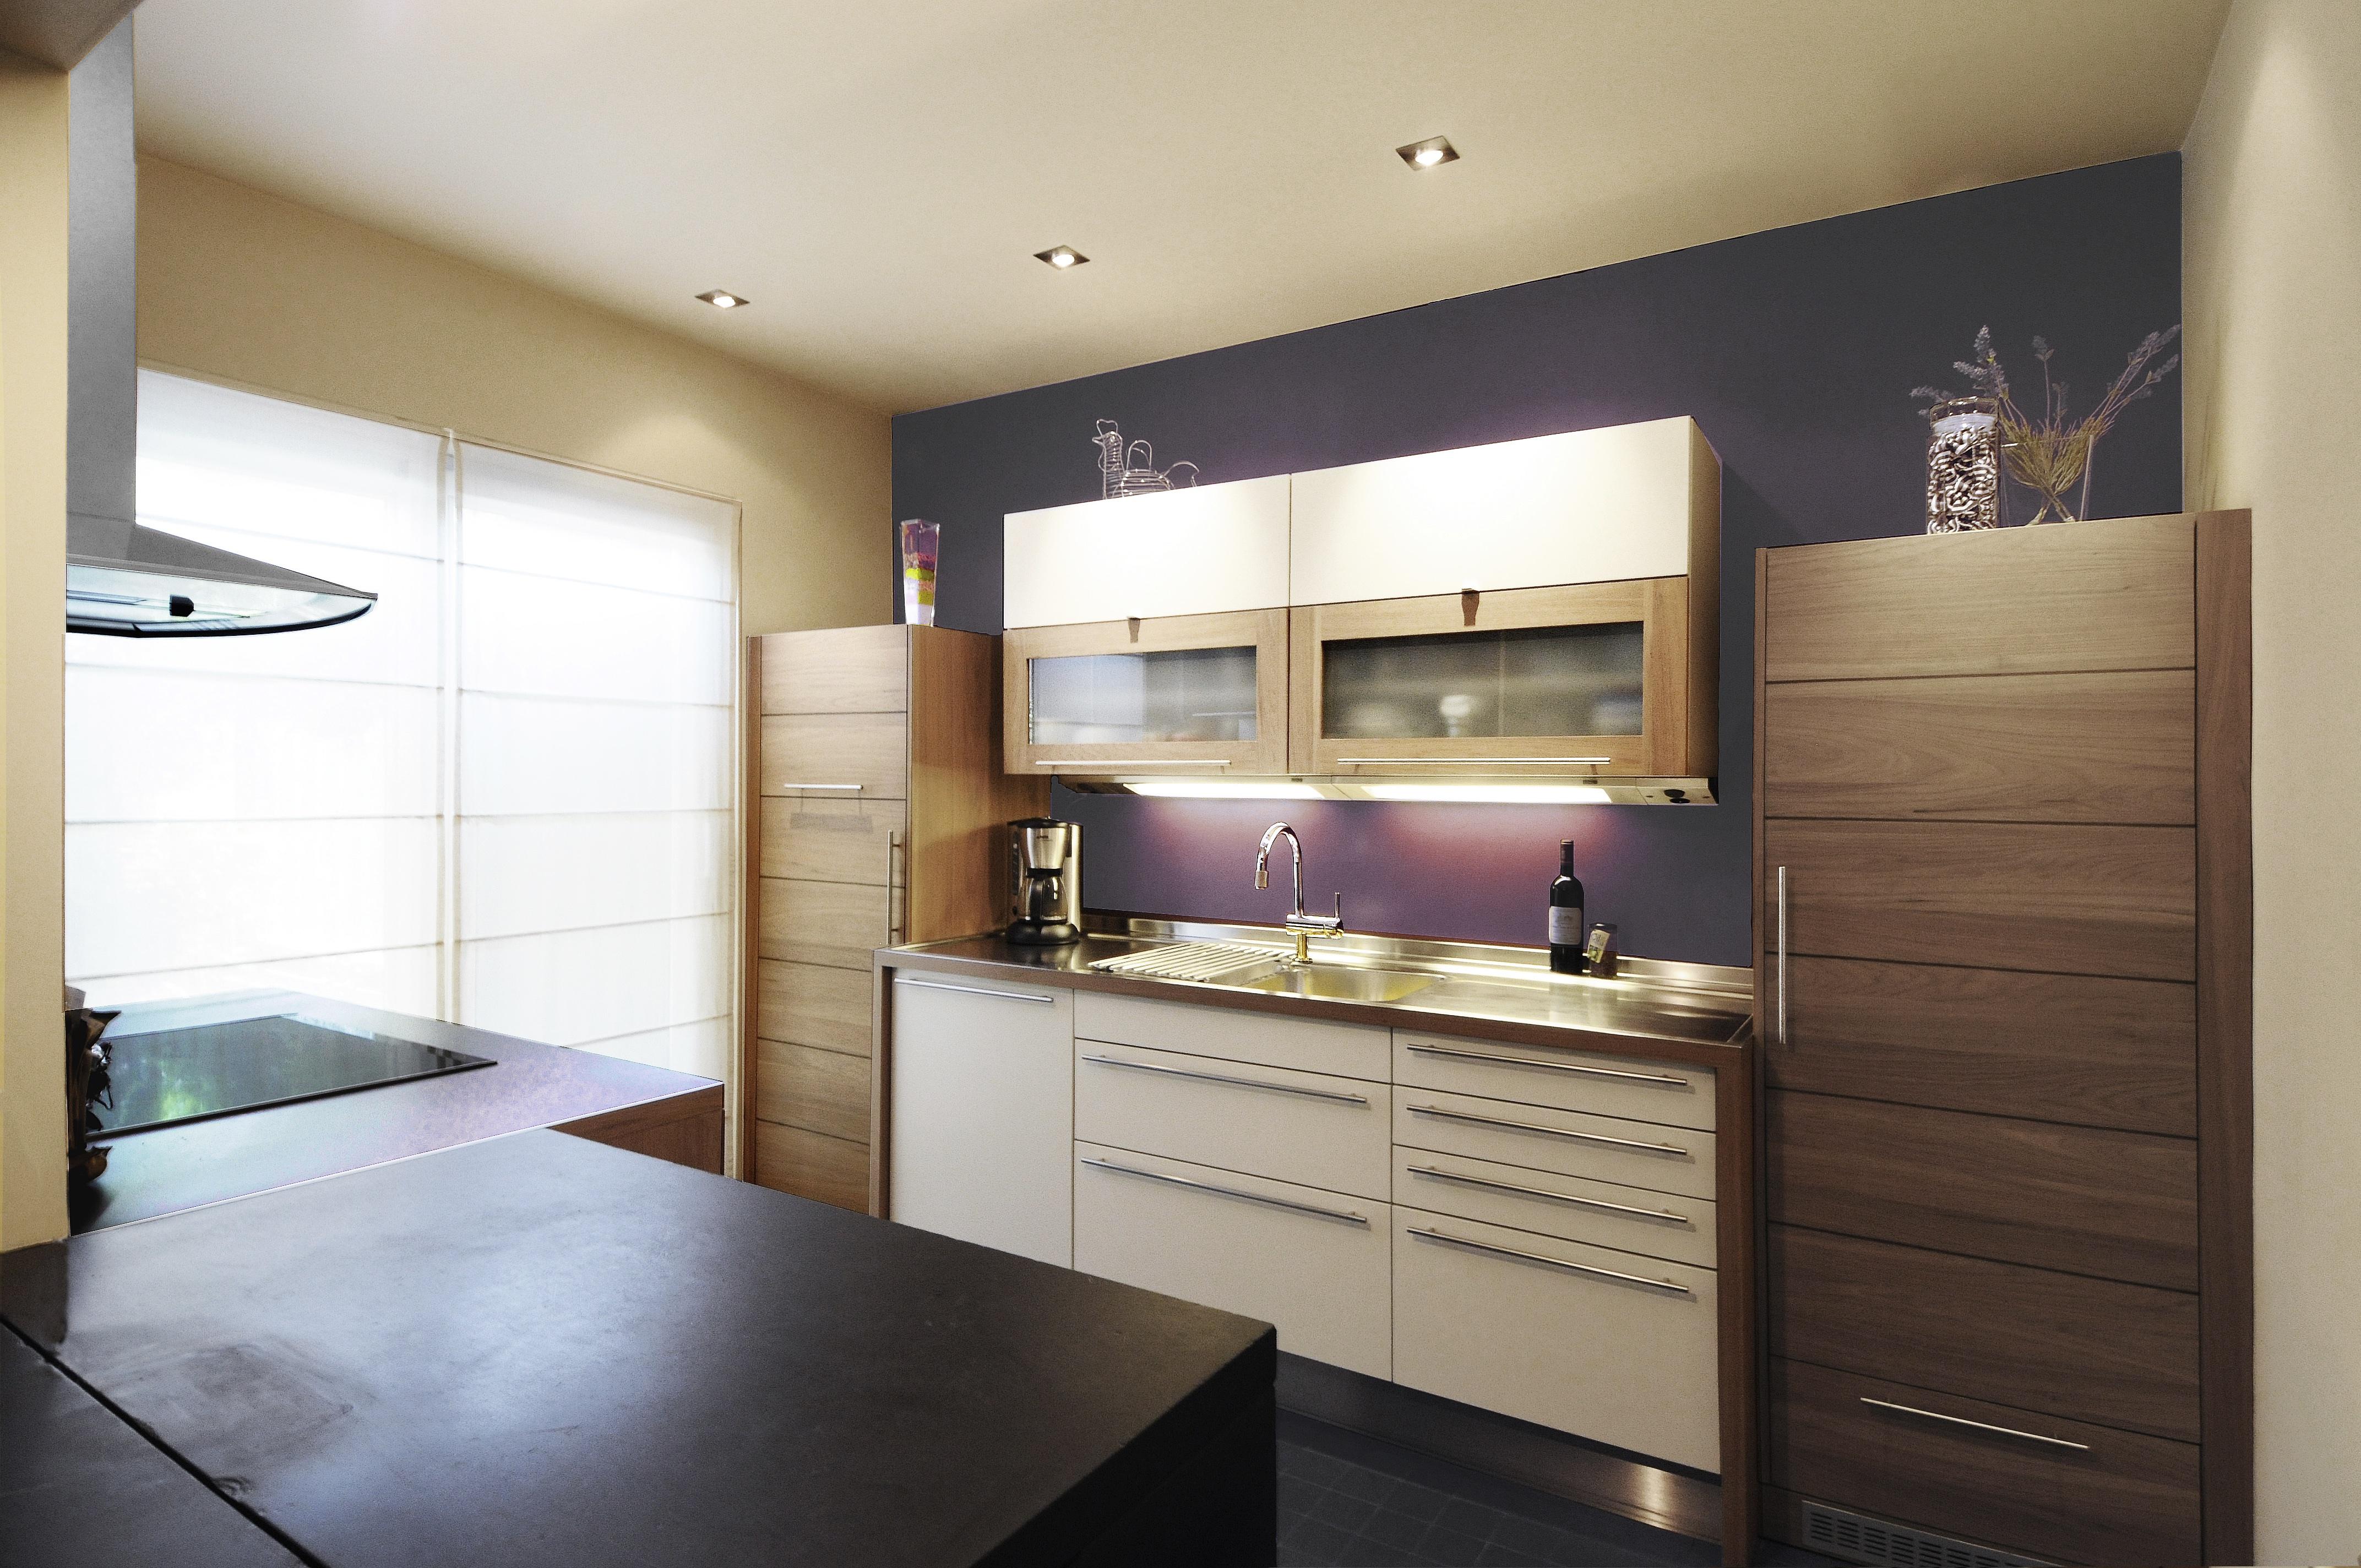 cuisine-decoration-liege-wege-pierre